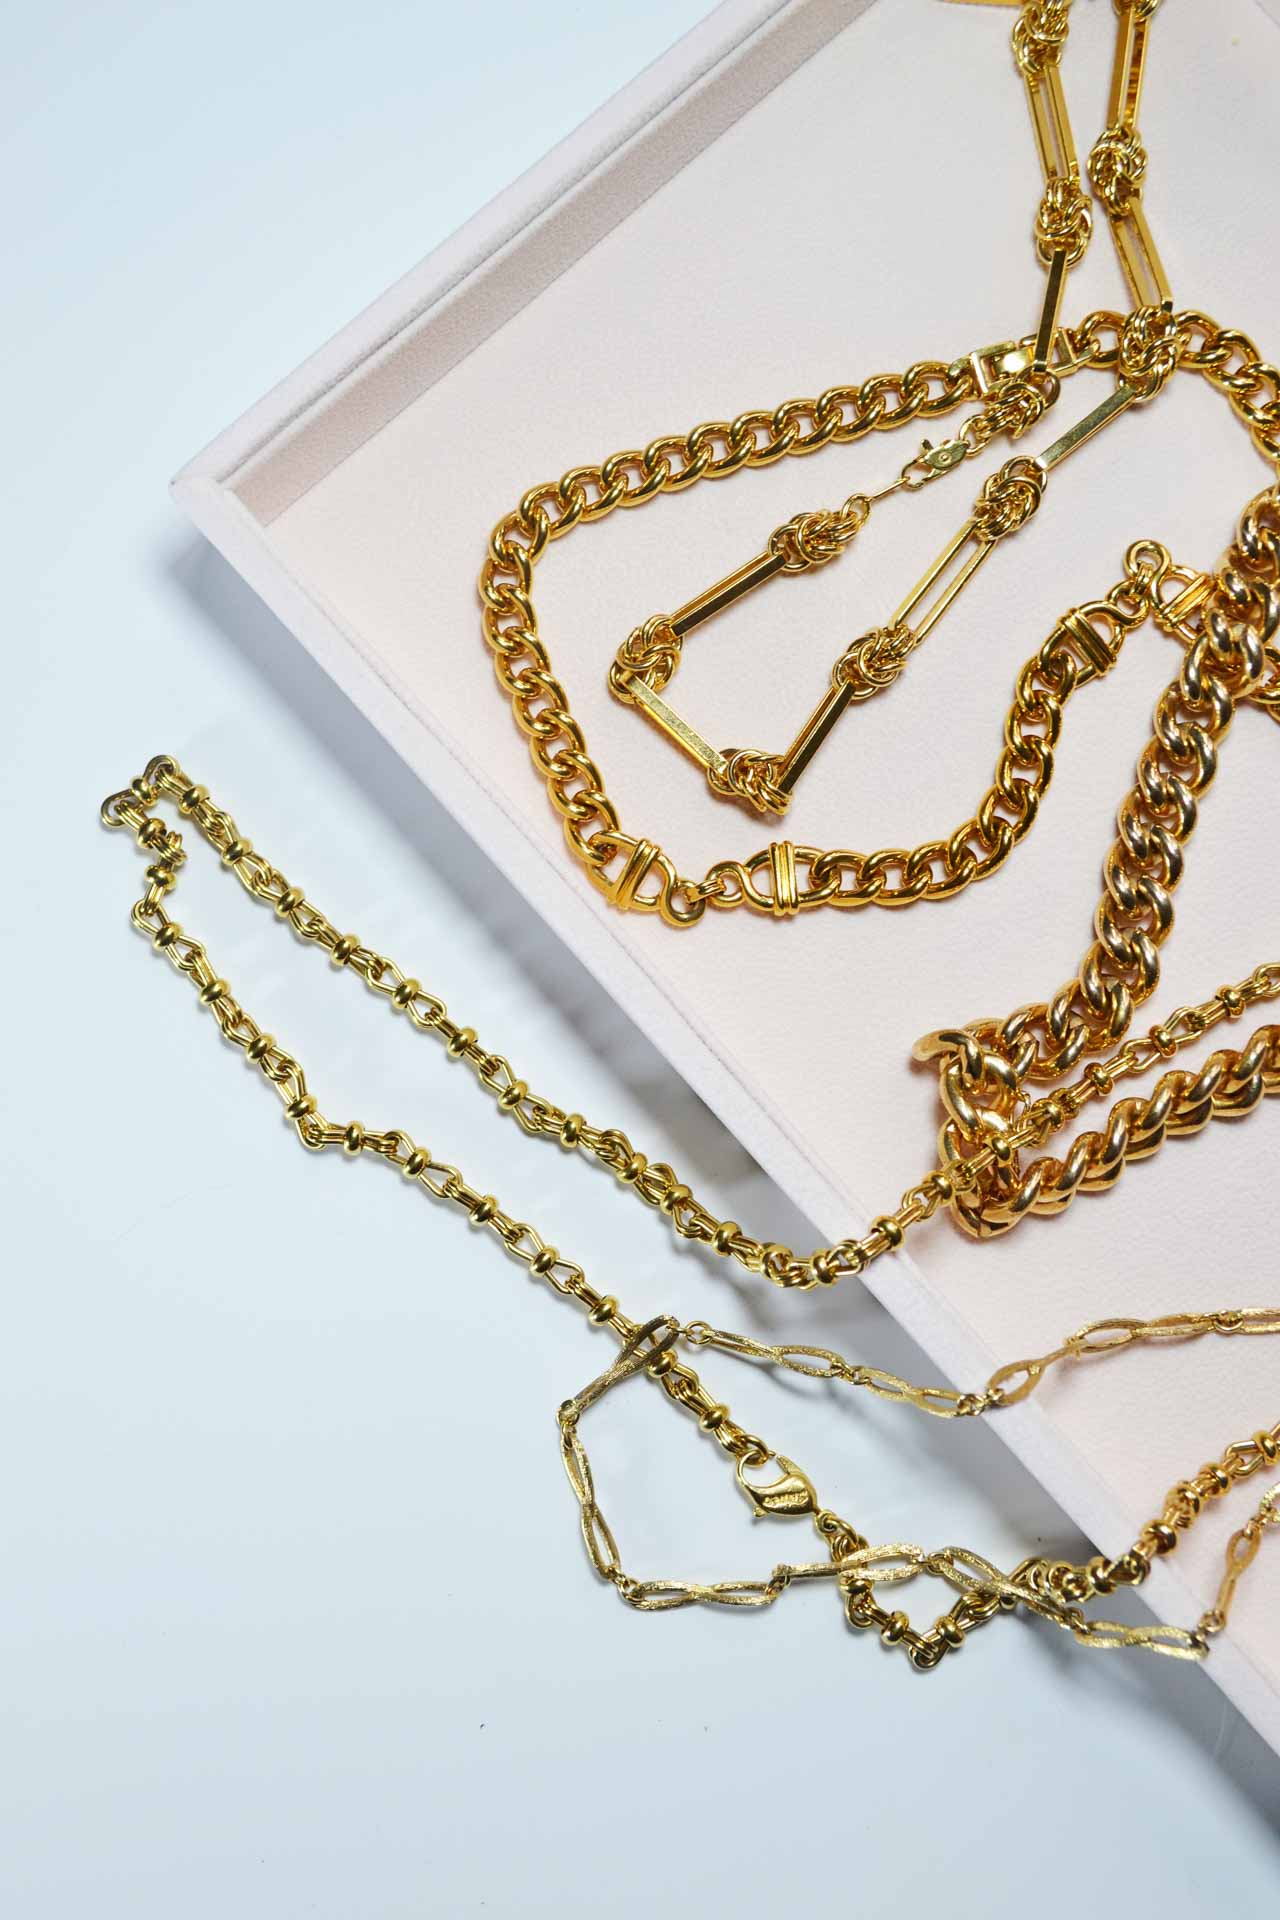 Insane Chains Jennifer Gibson Gold Vintage Jewellery